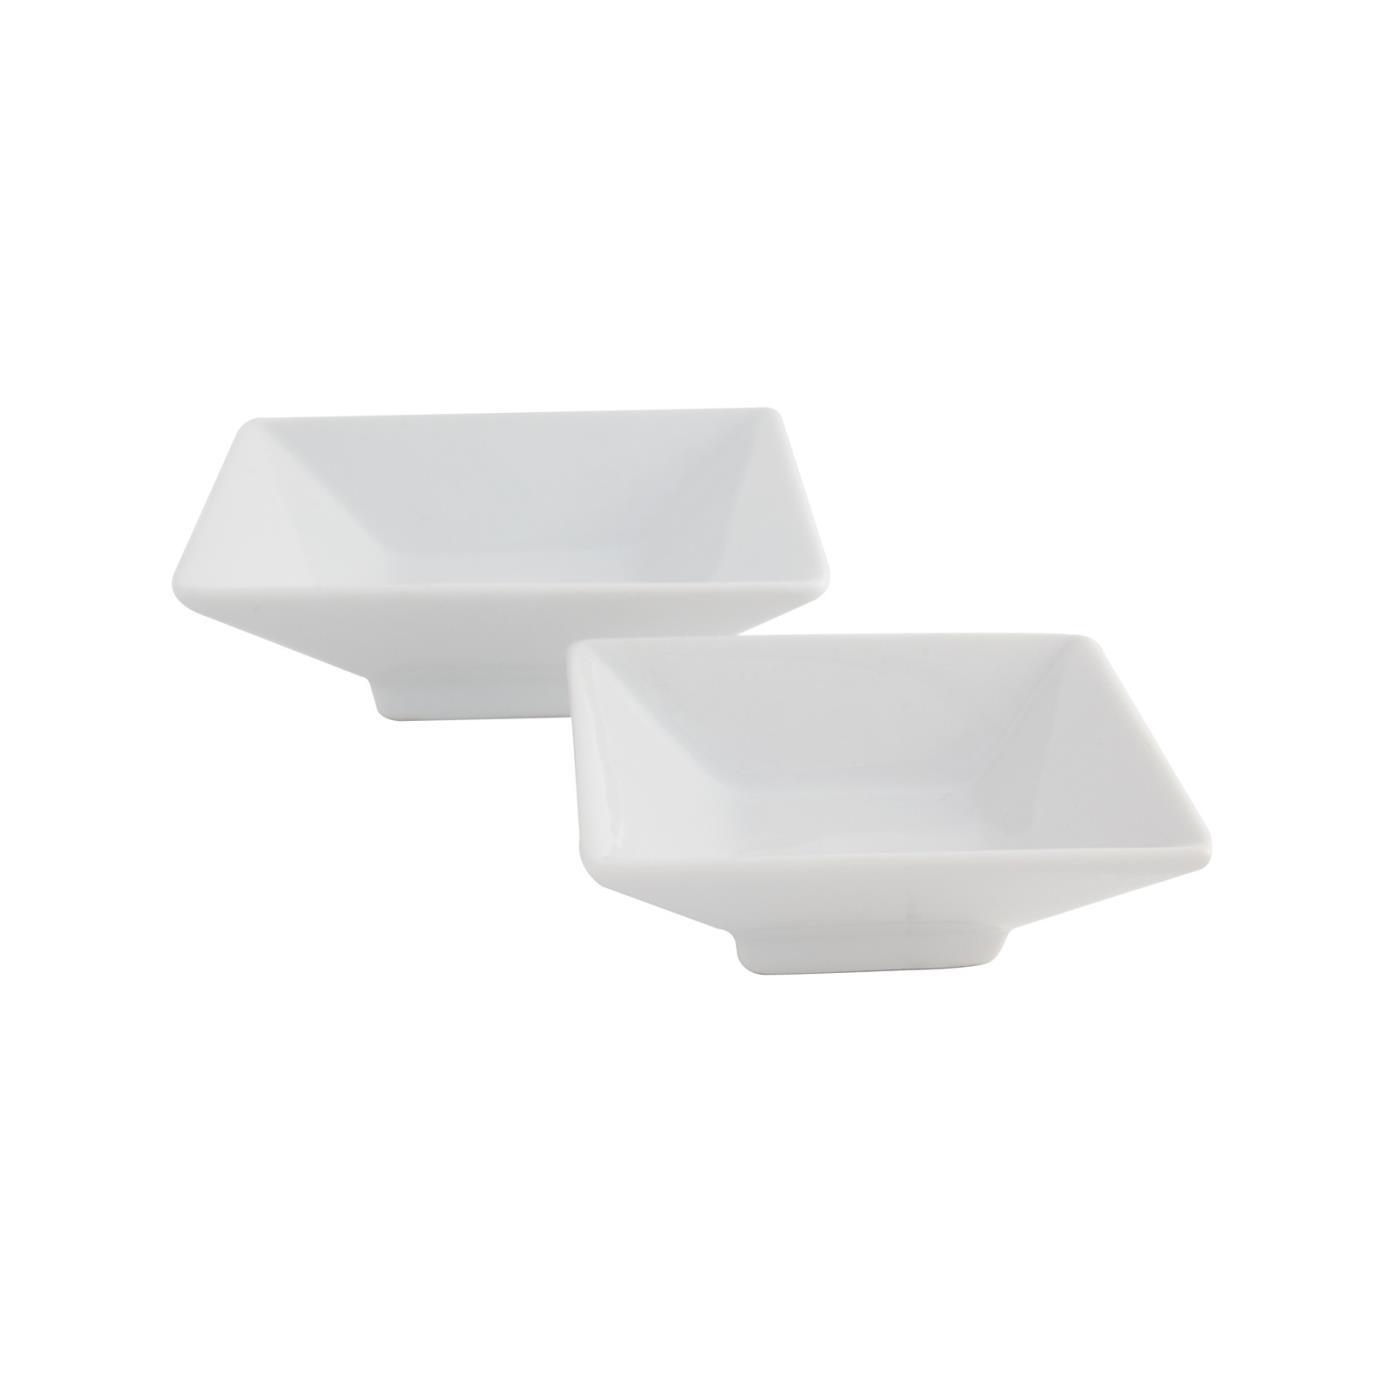 White Square Pedestal Dish